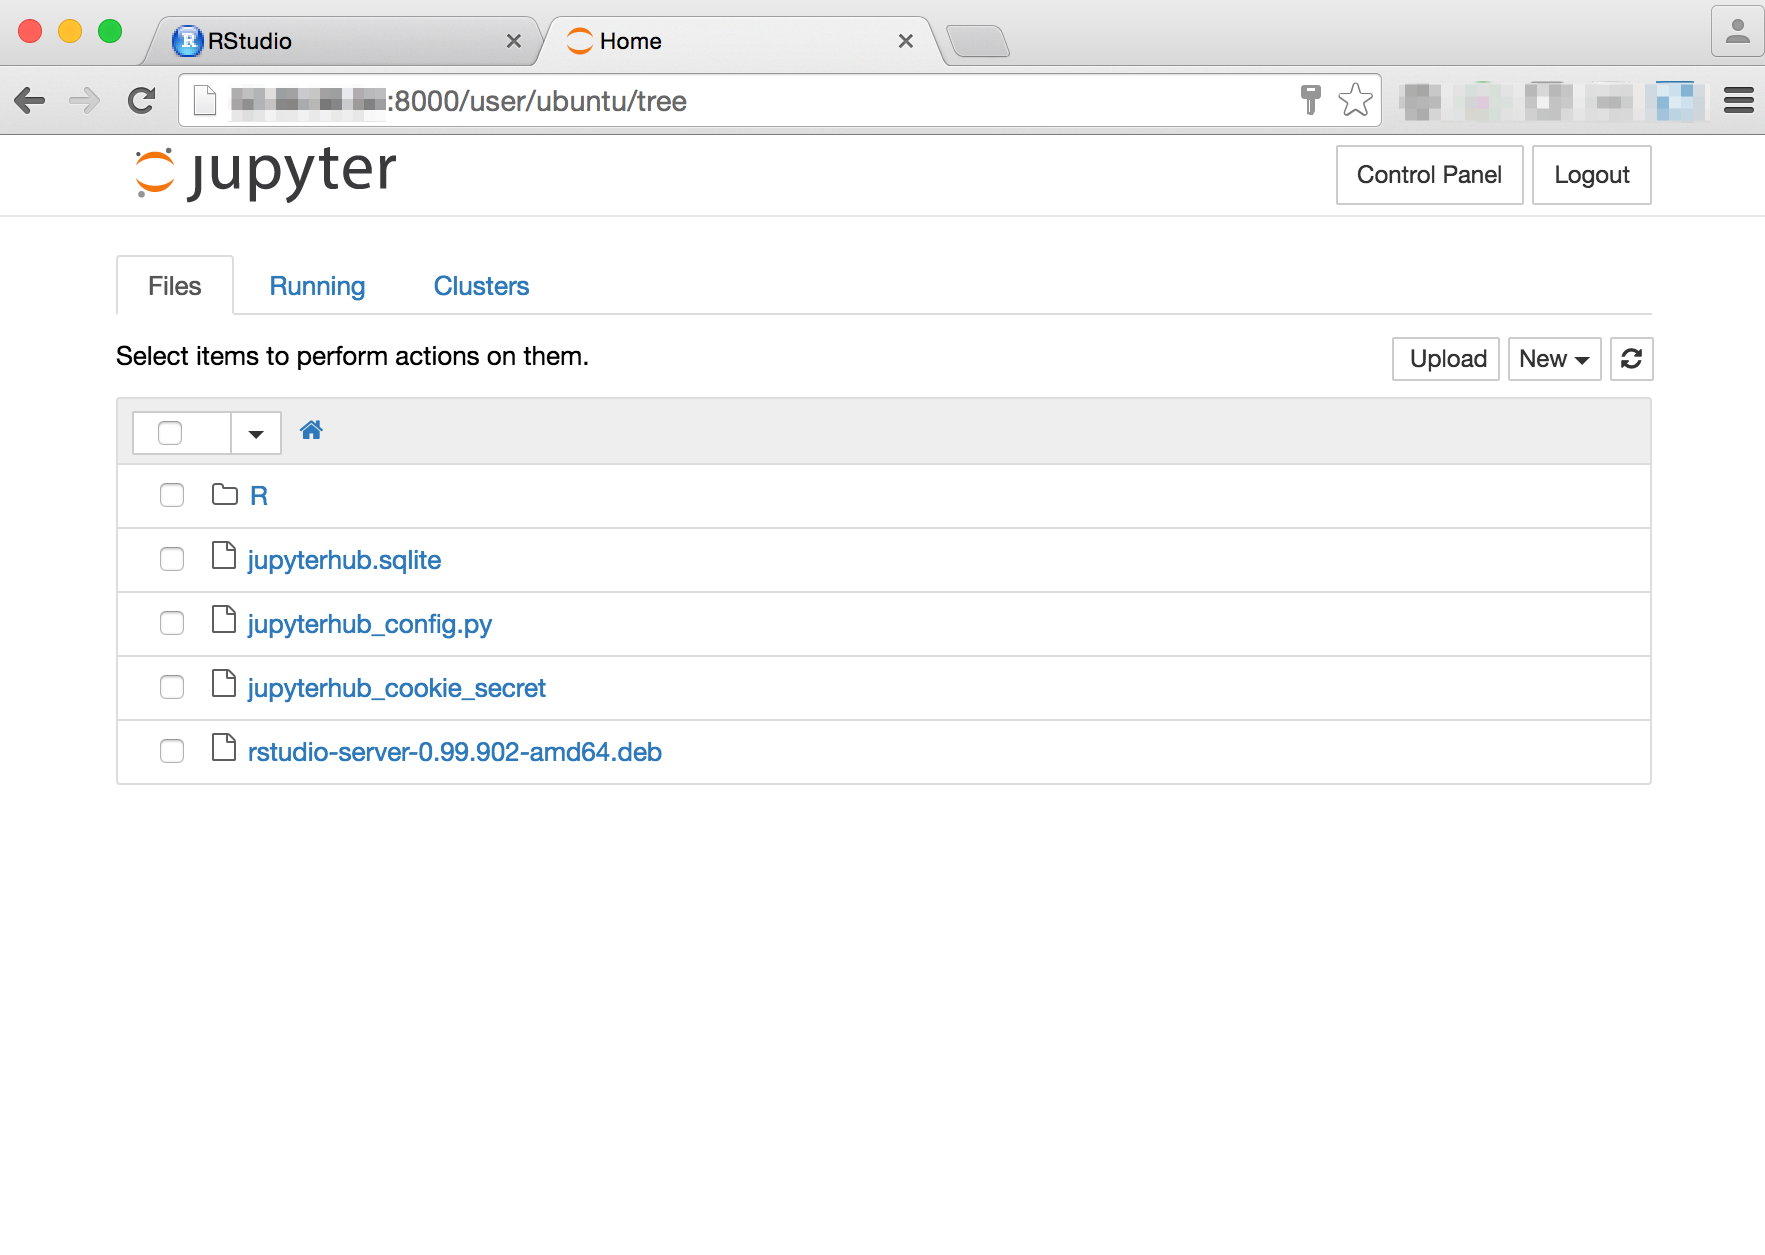 ubuntu1404-RStudio-JupyterHub_07